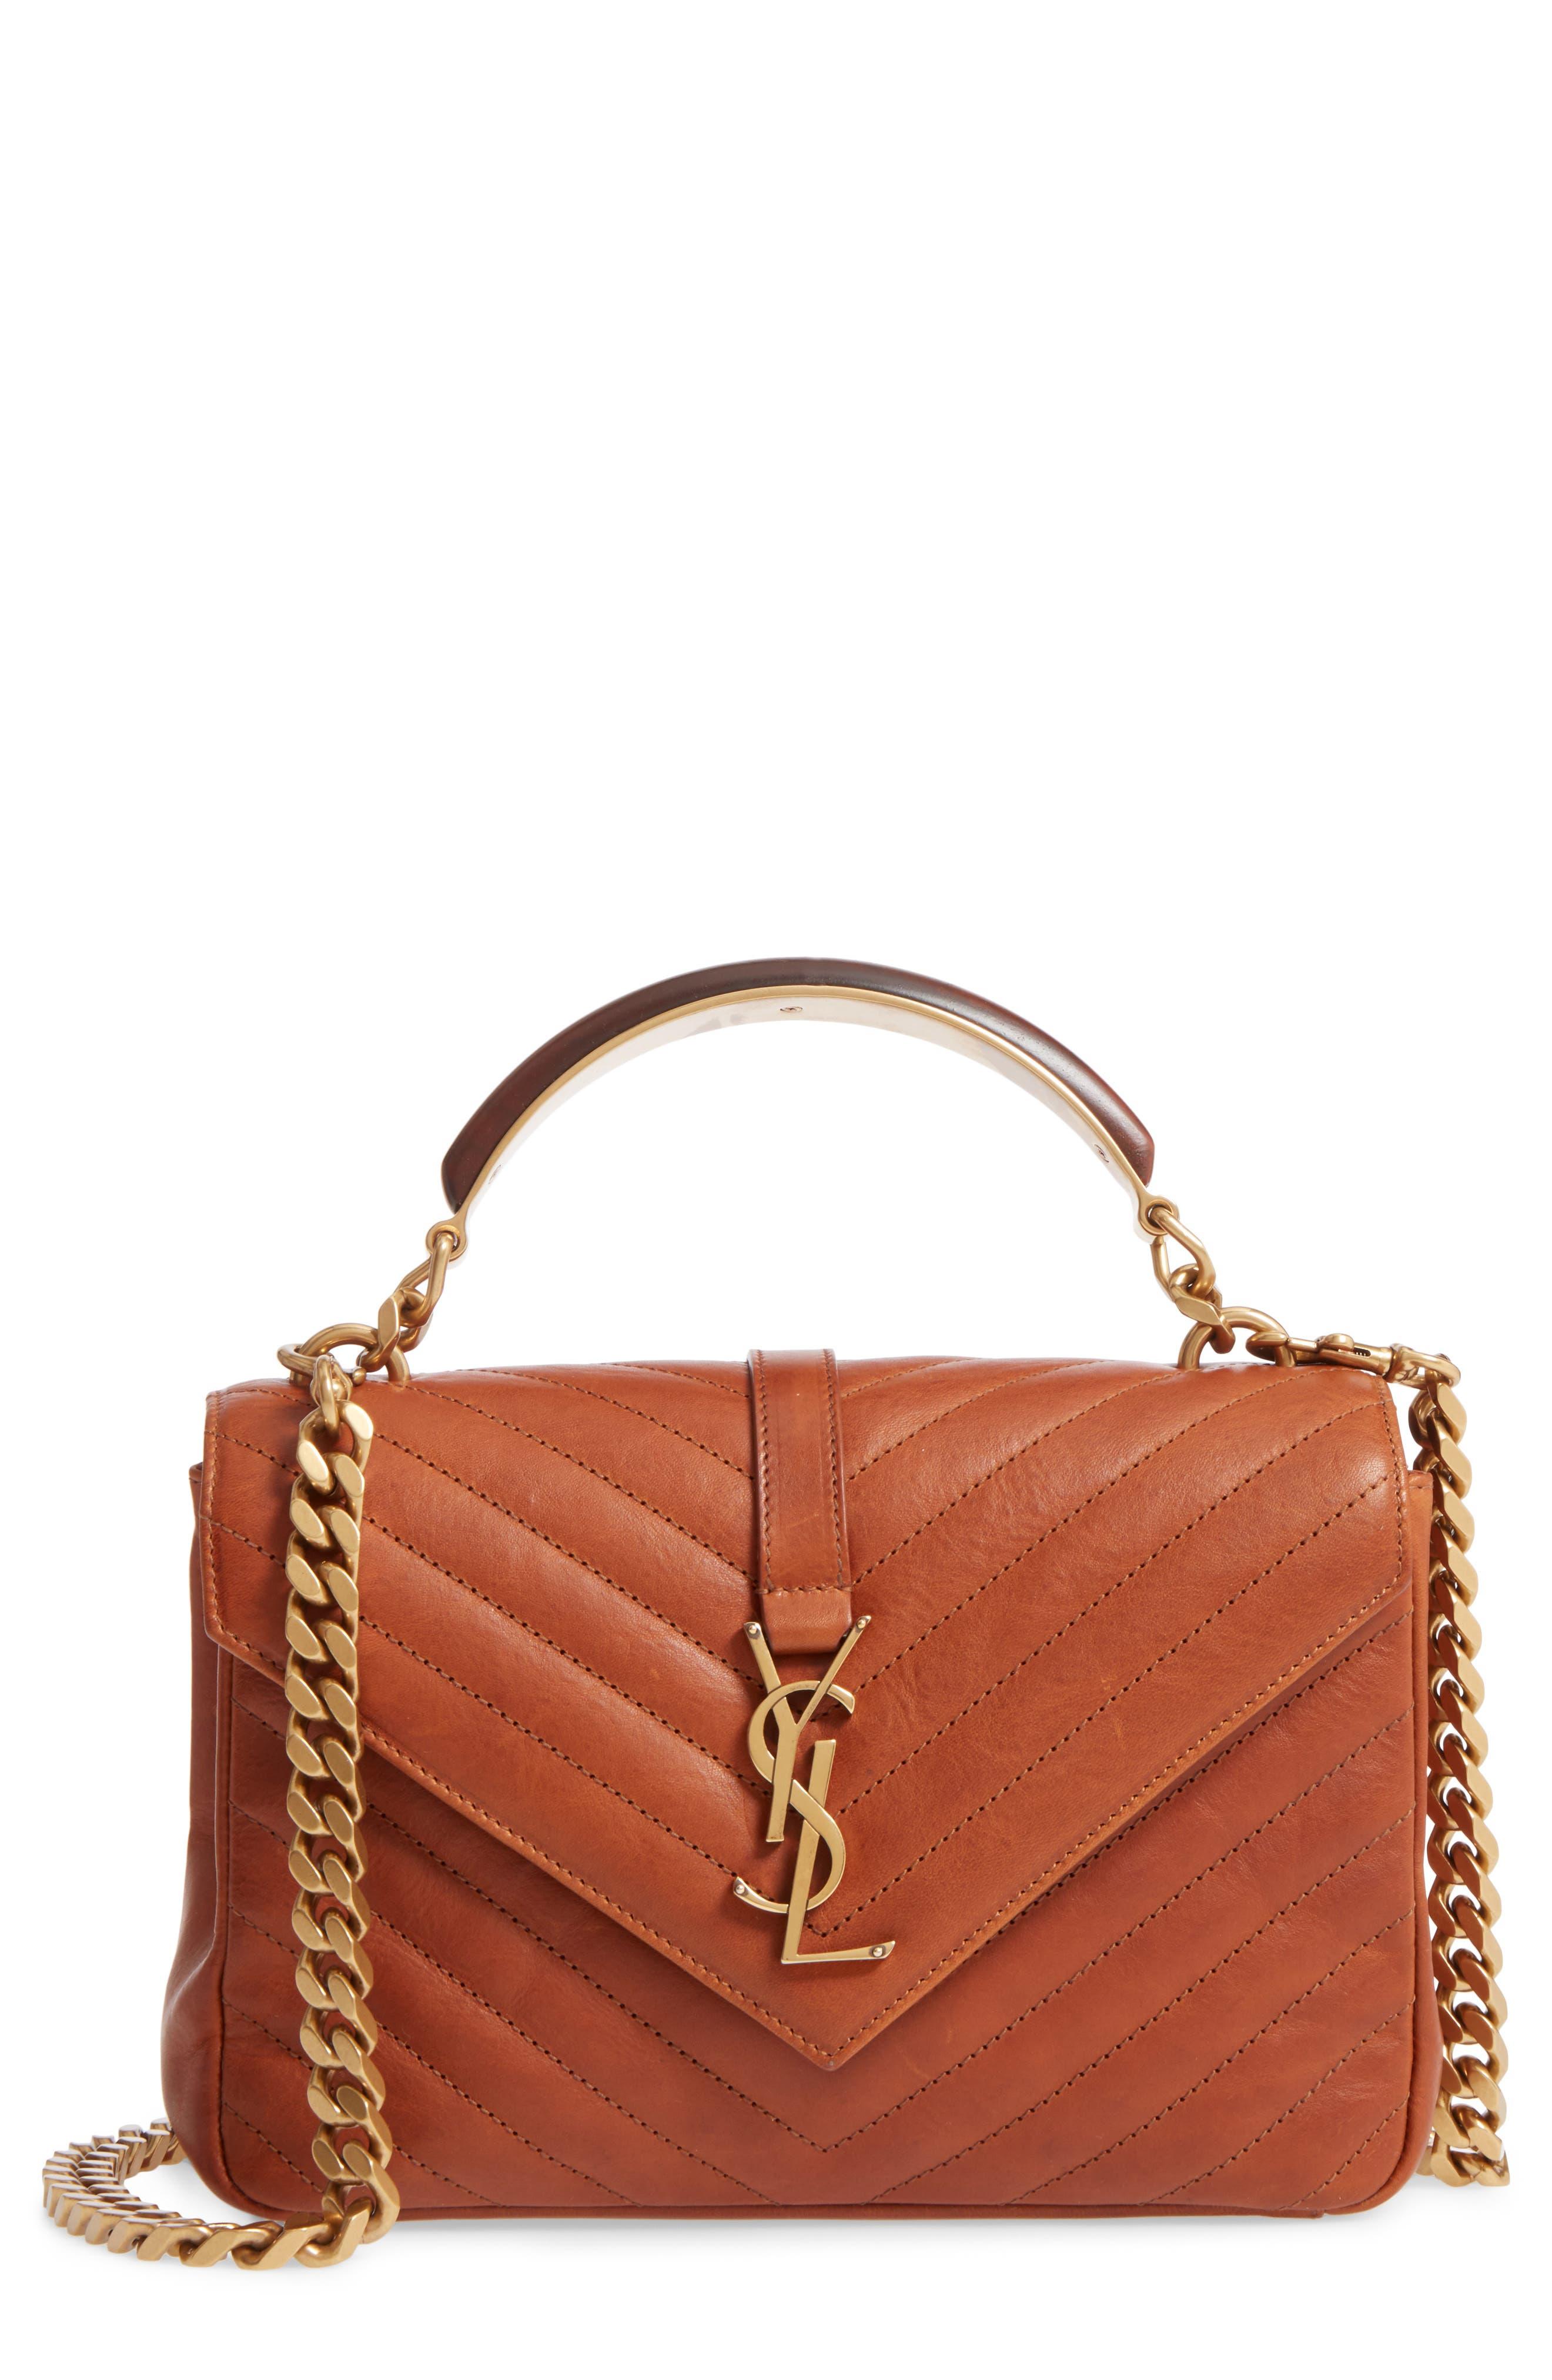 Saint Laurent Medium College Matelassé Leather Top Handle Bag